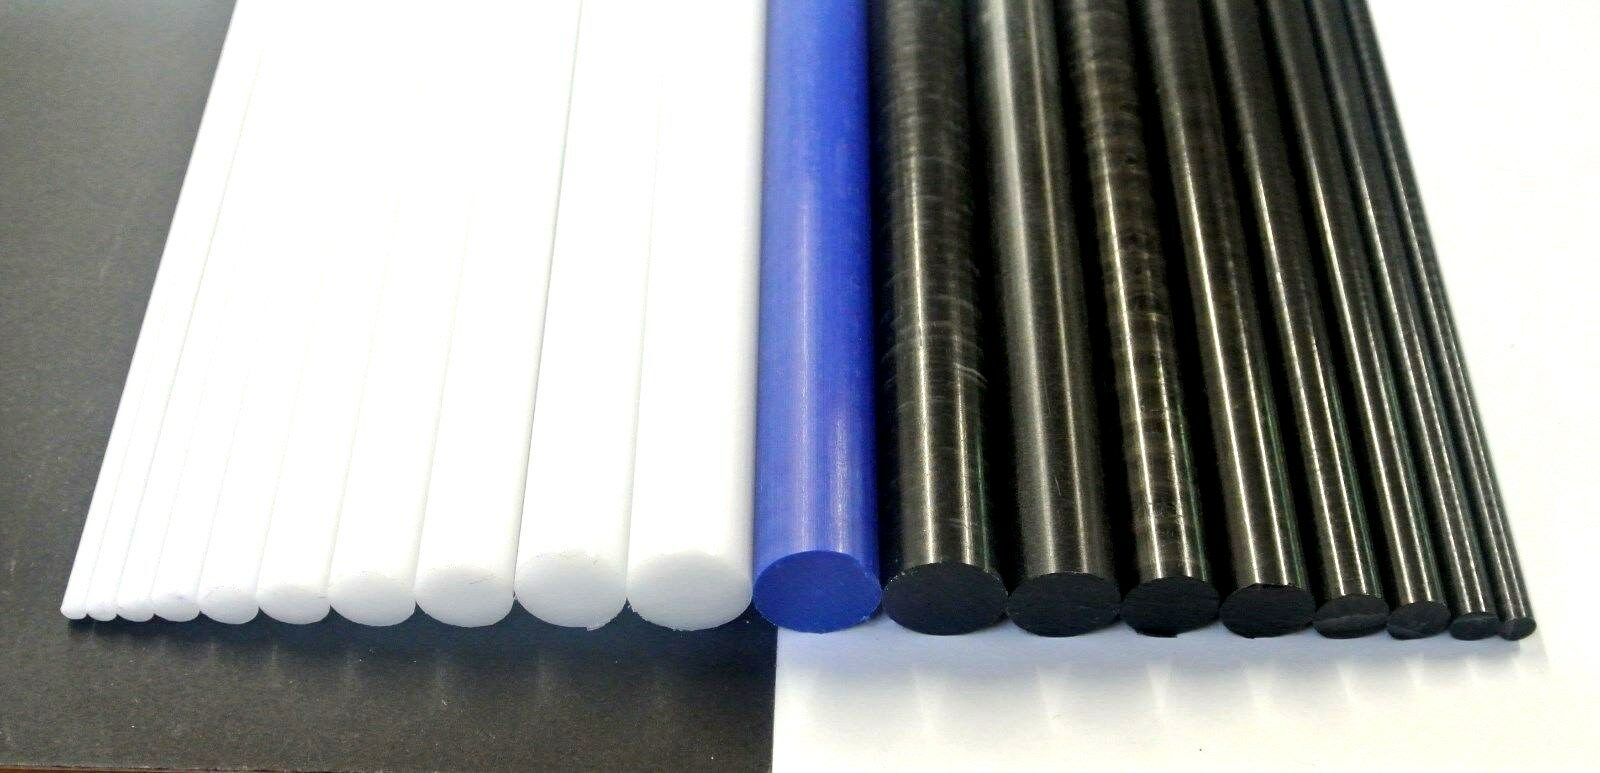 Acetal Rod Black White Blue Engineering Plastic Round Bar Billet Spacer 4mm-20mm